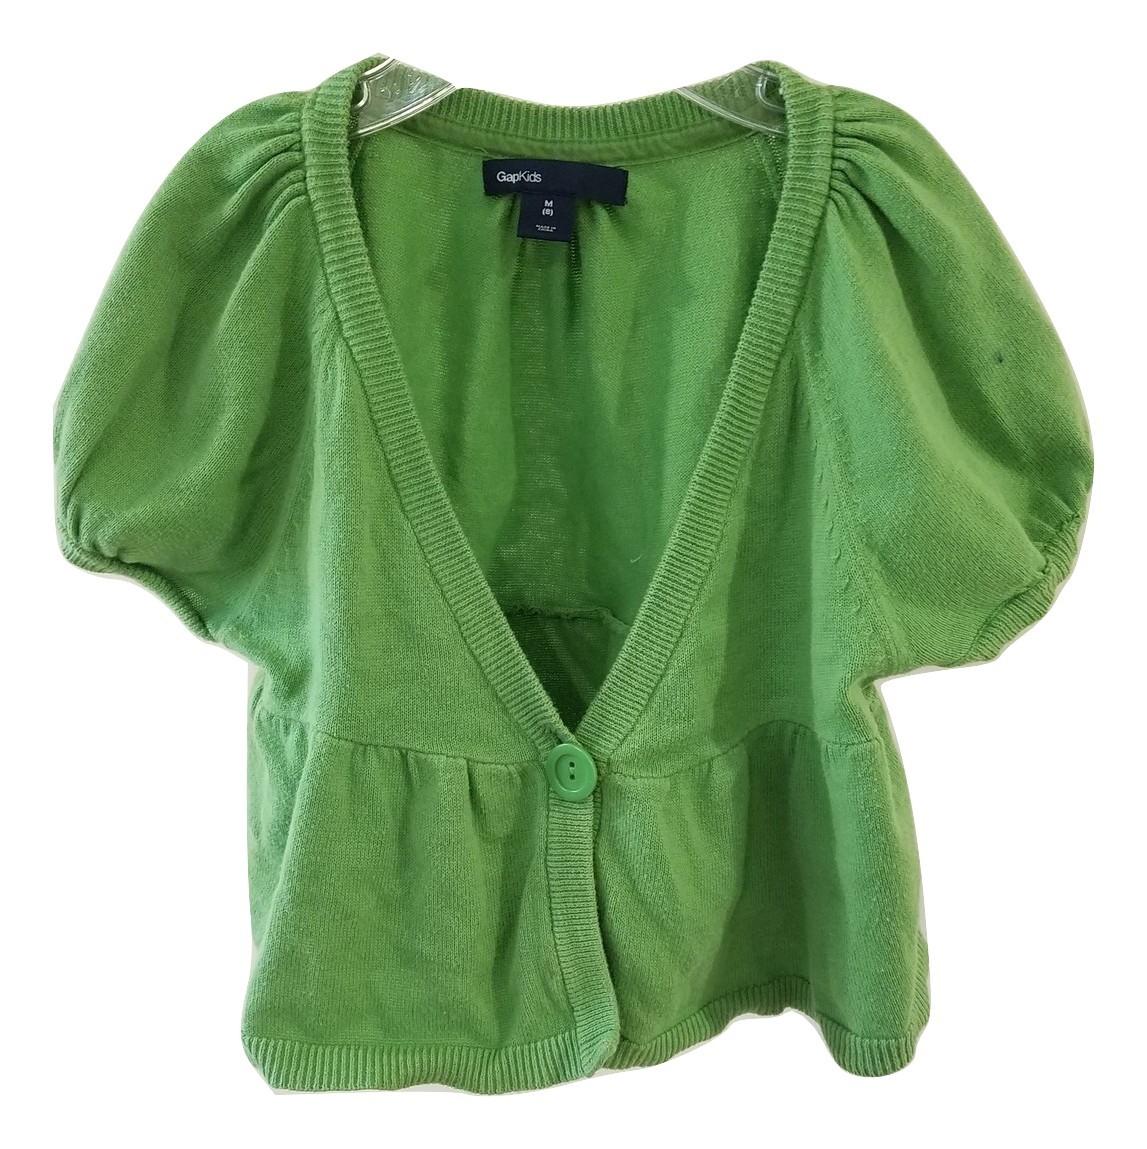 a4f2d6cbb38 Gap Brand Girls Kids Children Top Sweater and similar items